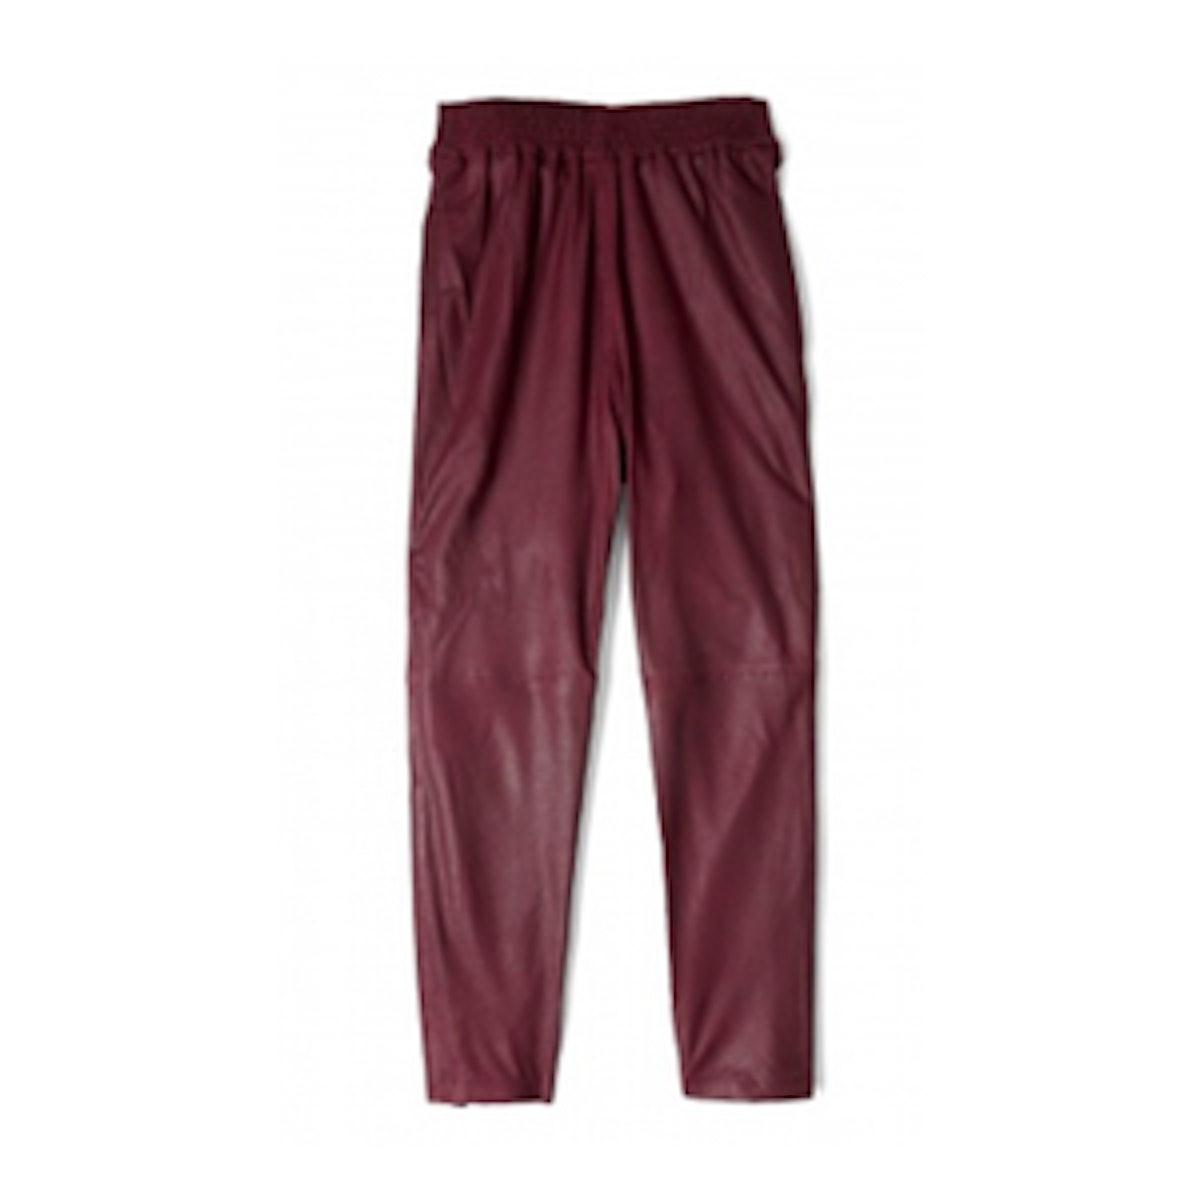 Cordovan Leather Trouser